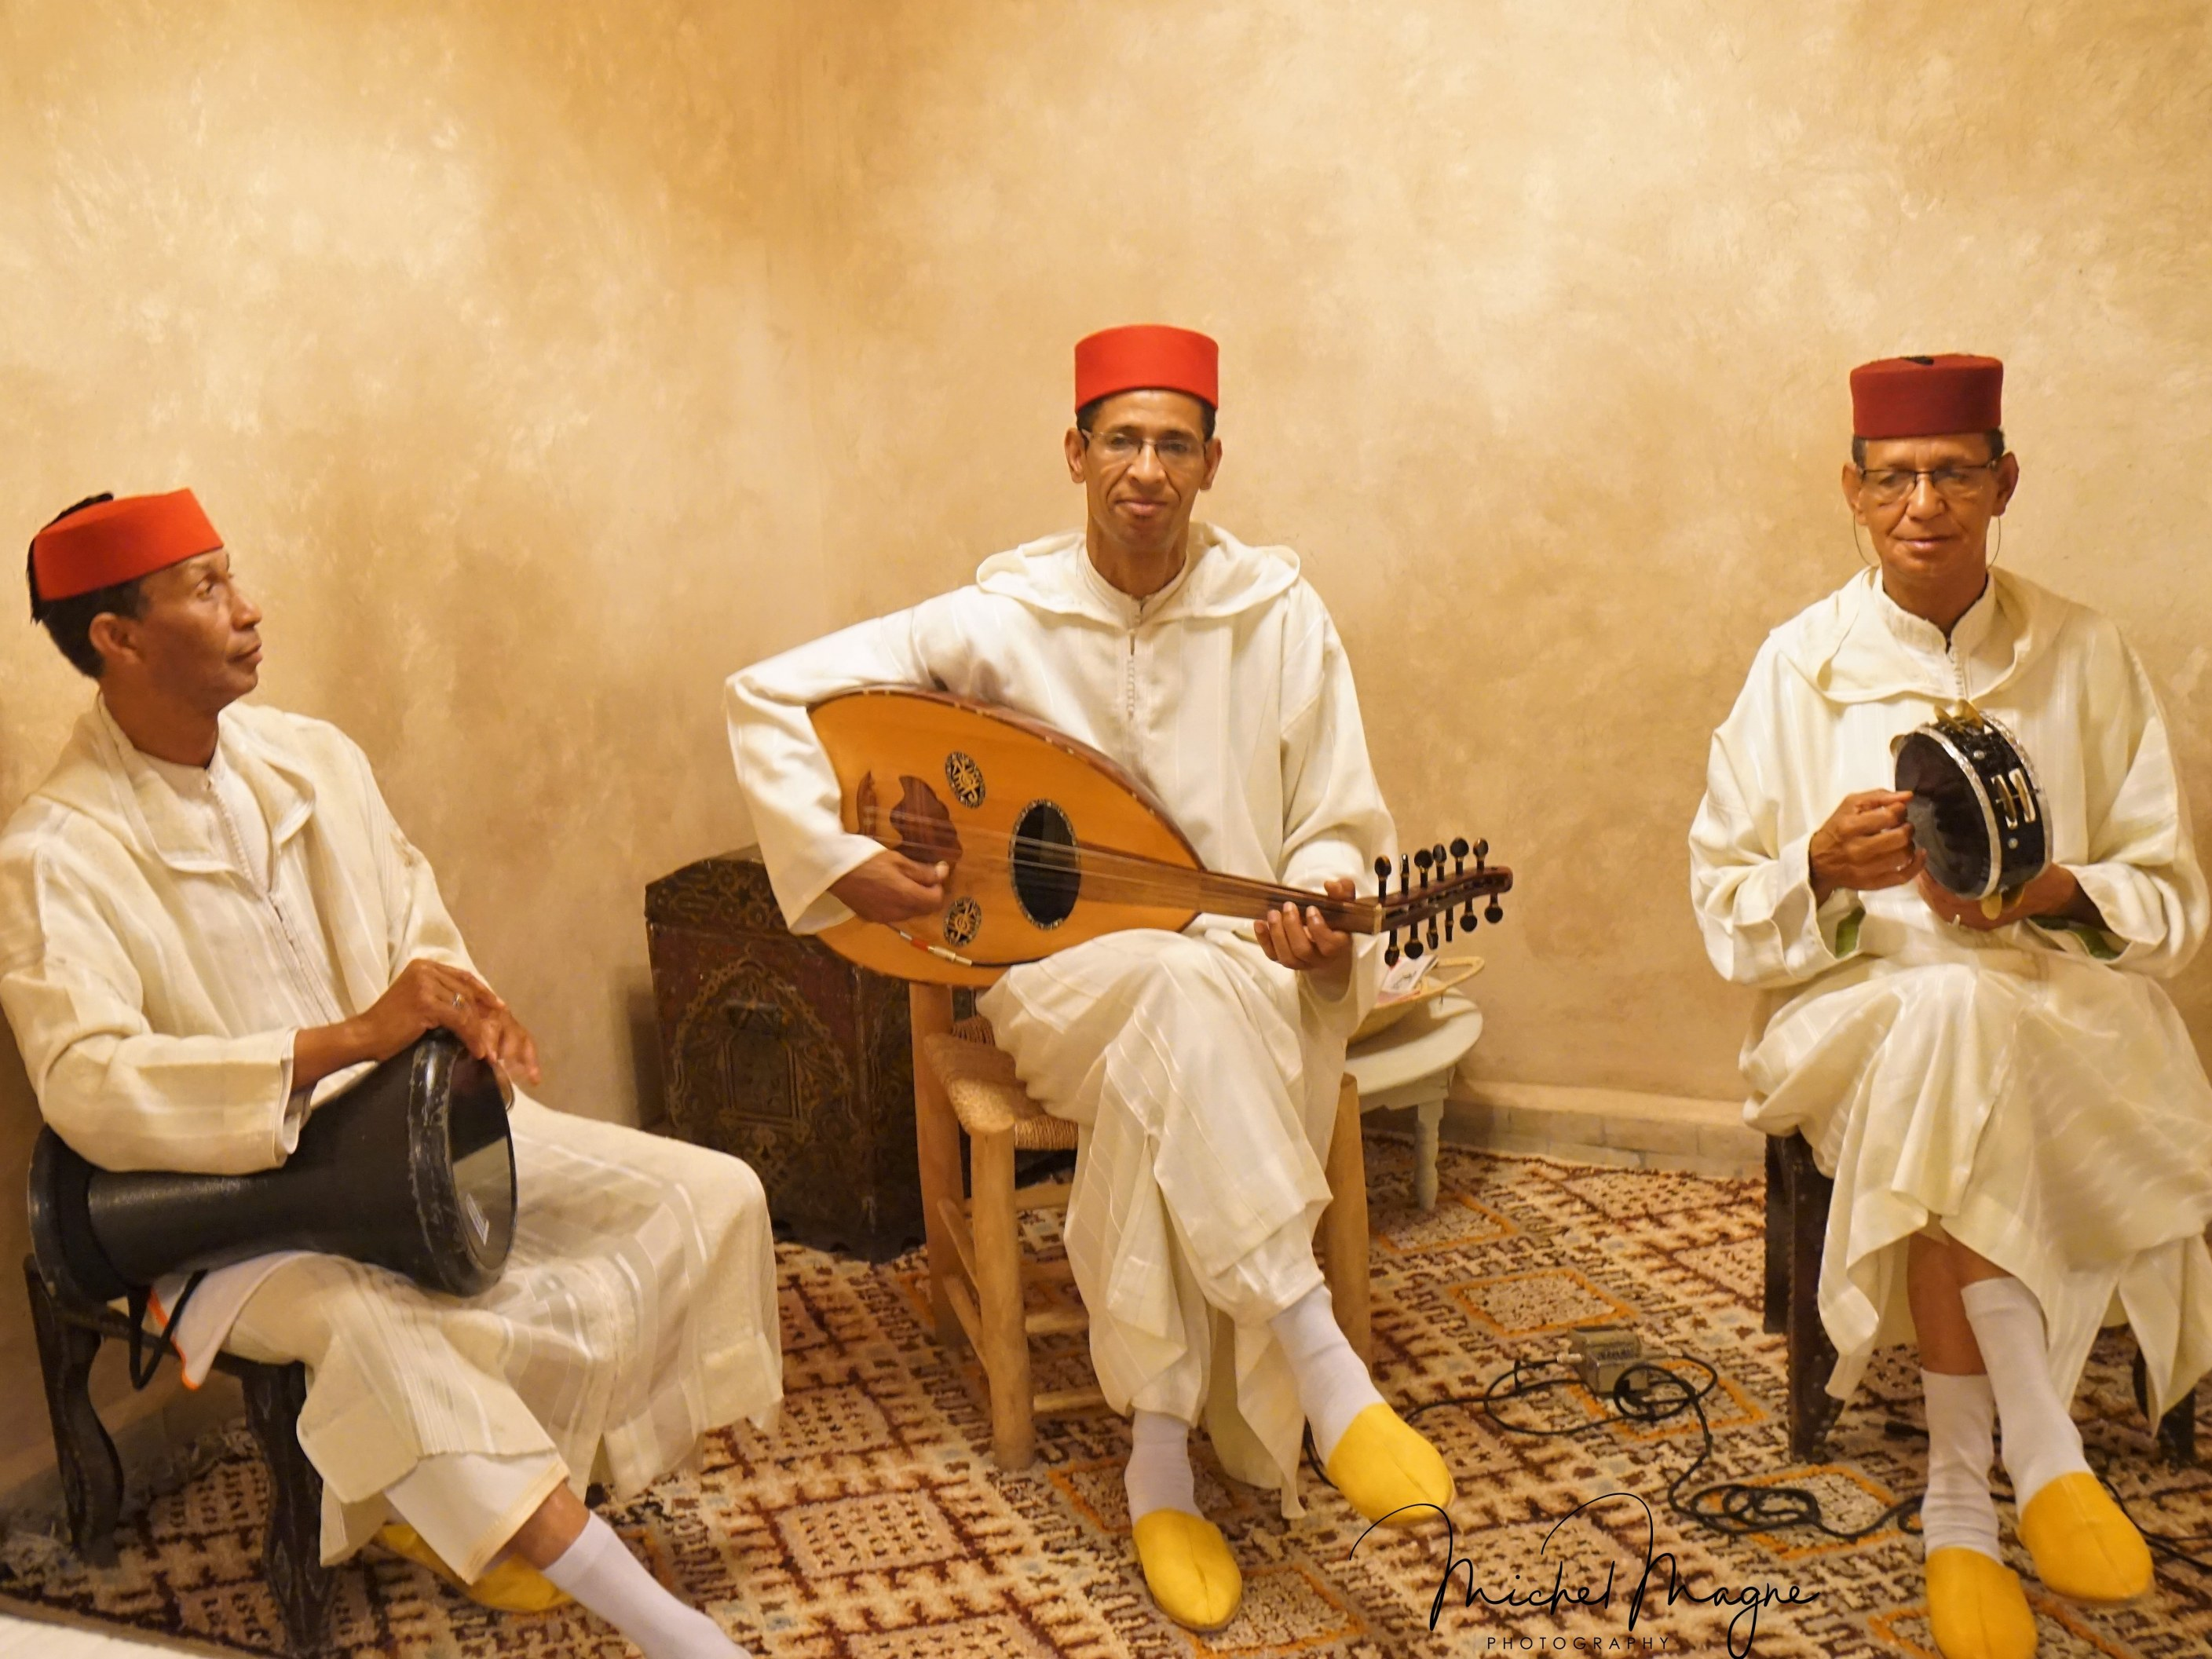 restaurant-marocain-marrakech-soiree-musicale-instrument-mama-beldi